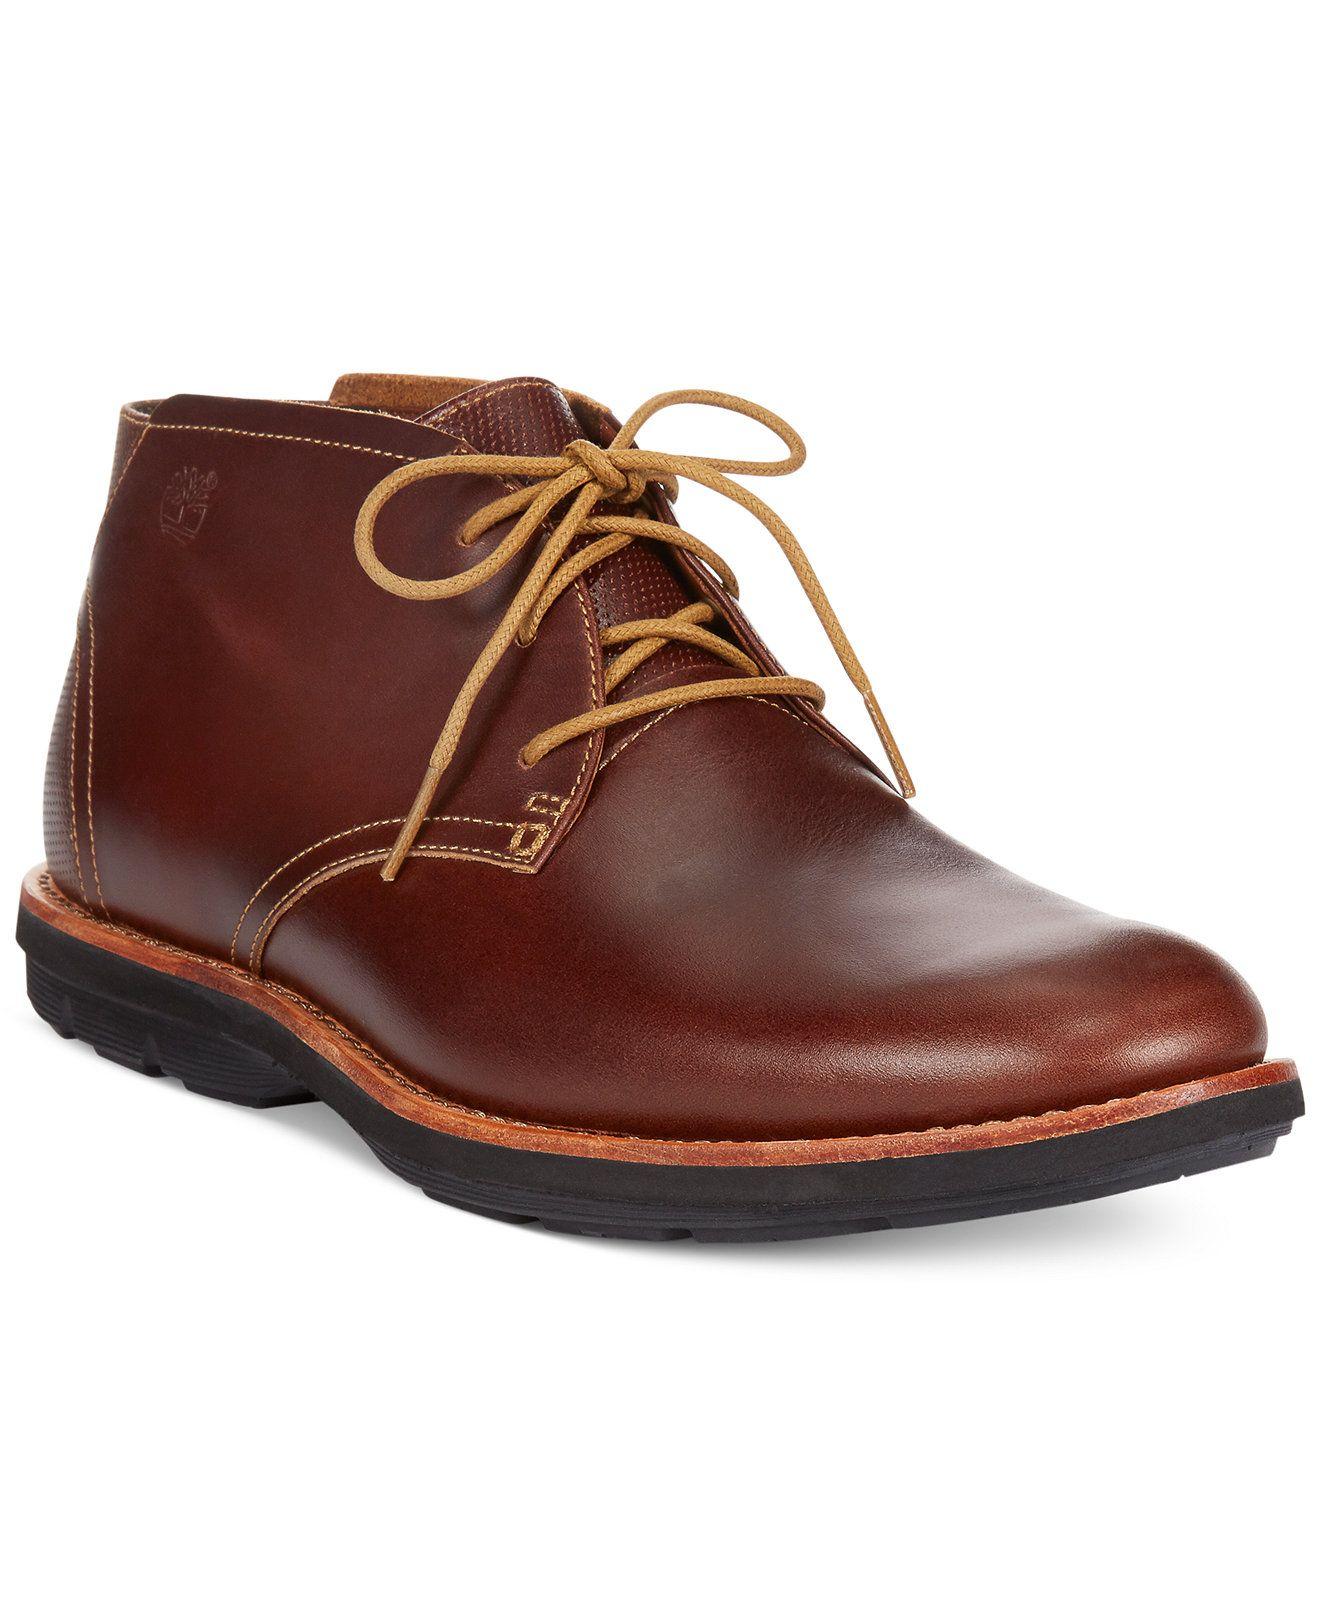 69095dcdf36 Timberland Earthkeepers Kempton Chukka Boot | FEET | Boots, Shoe ...